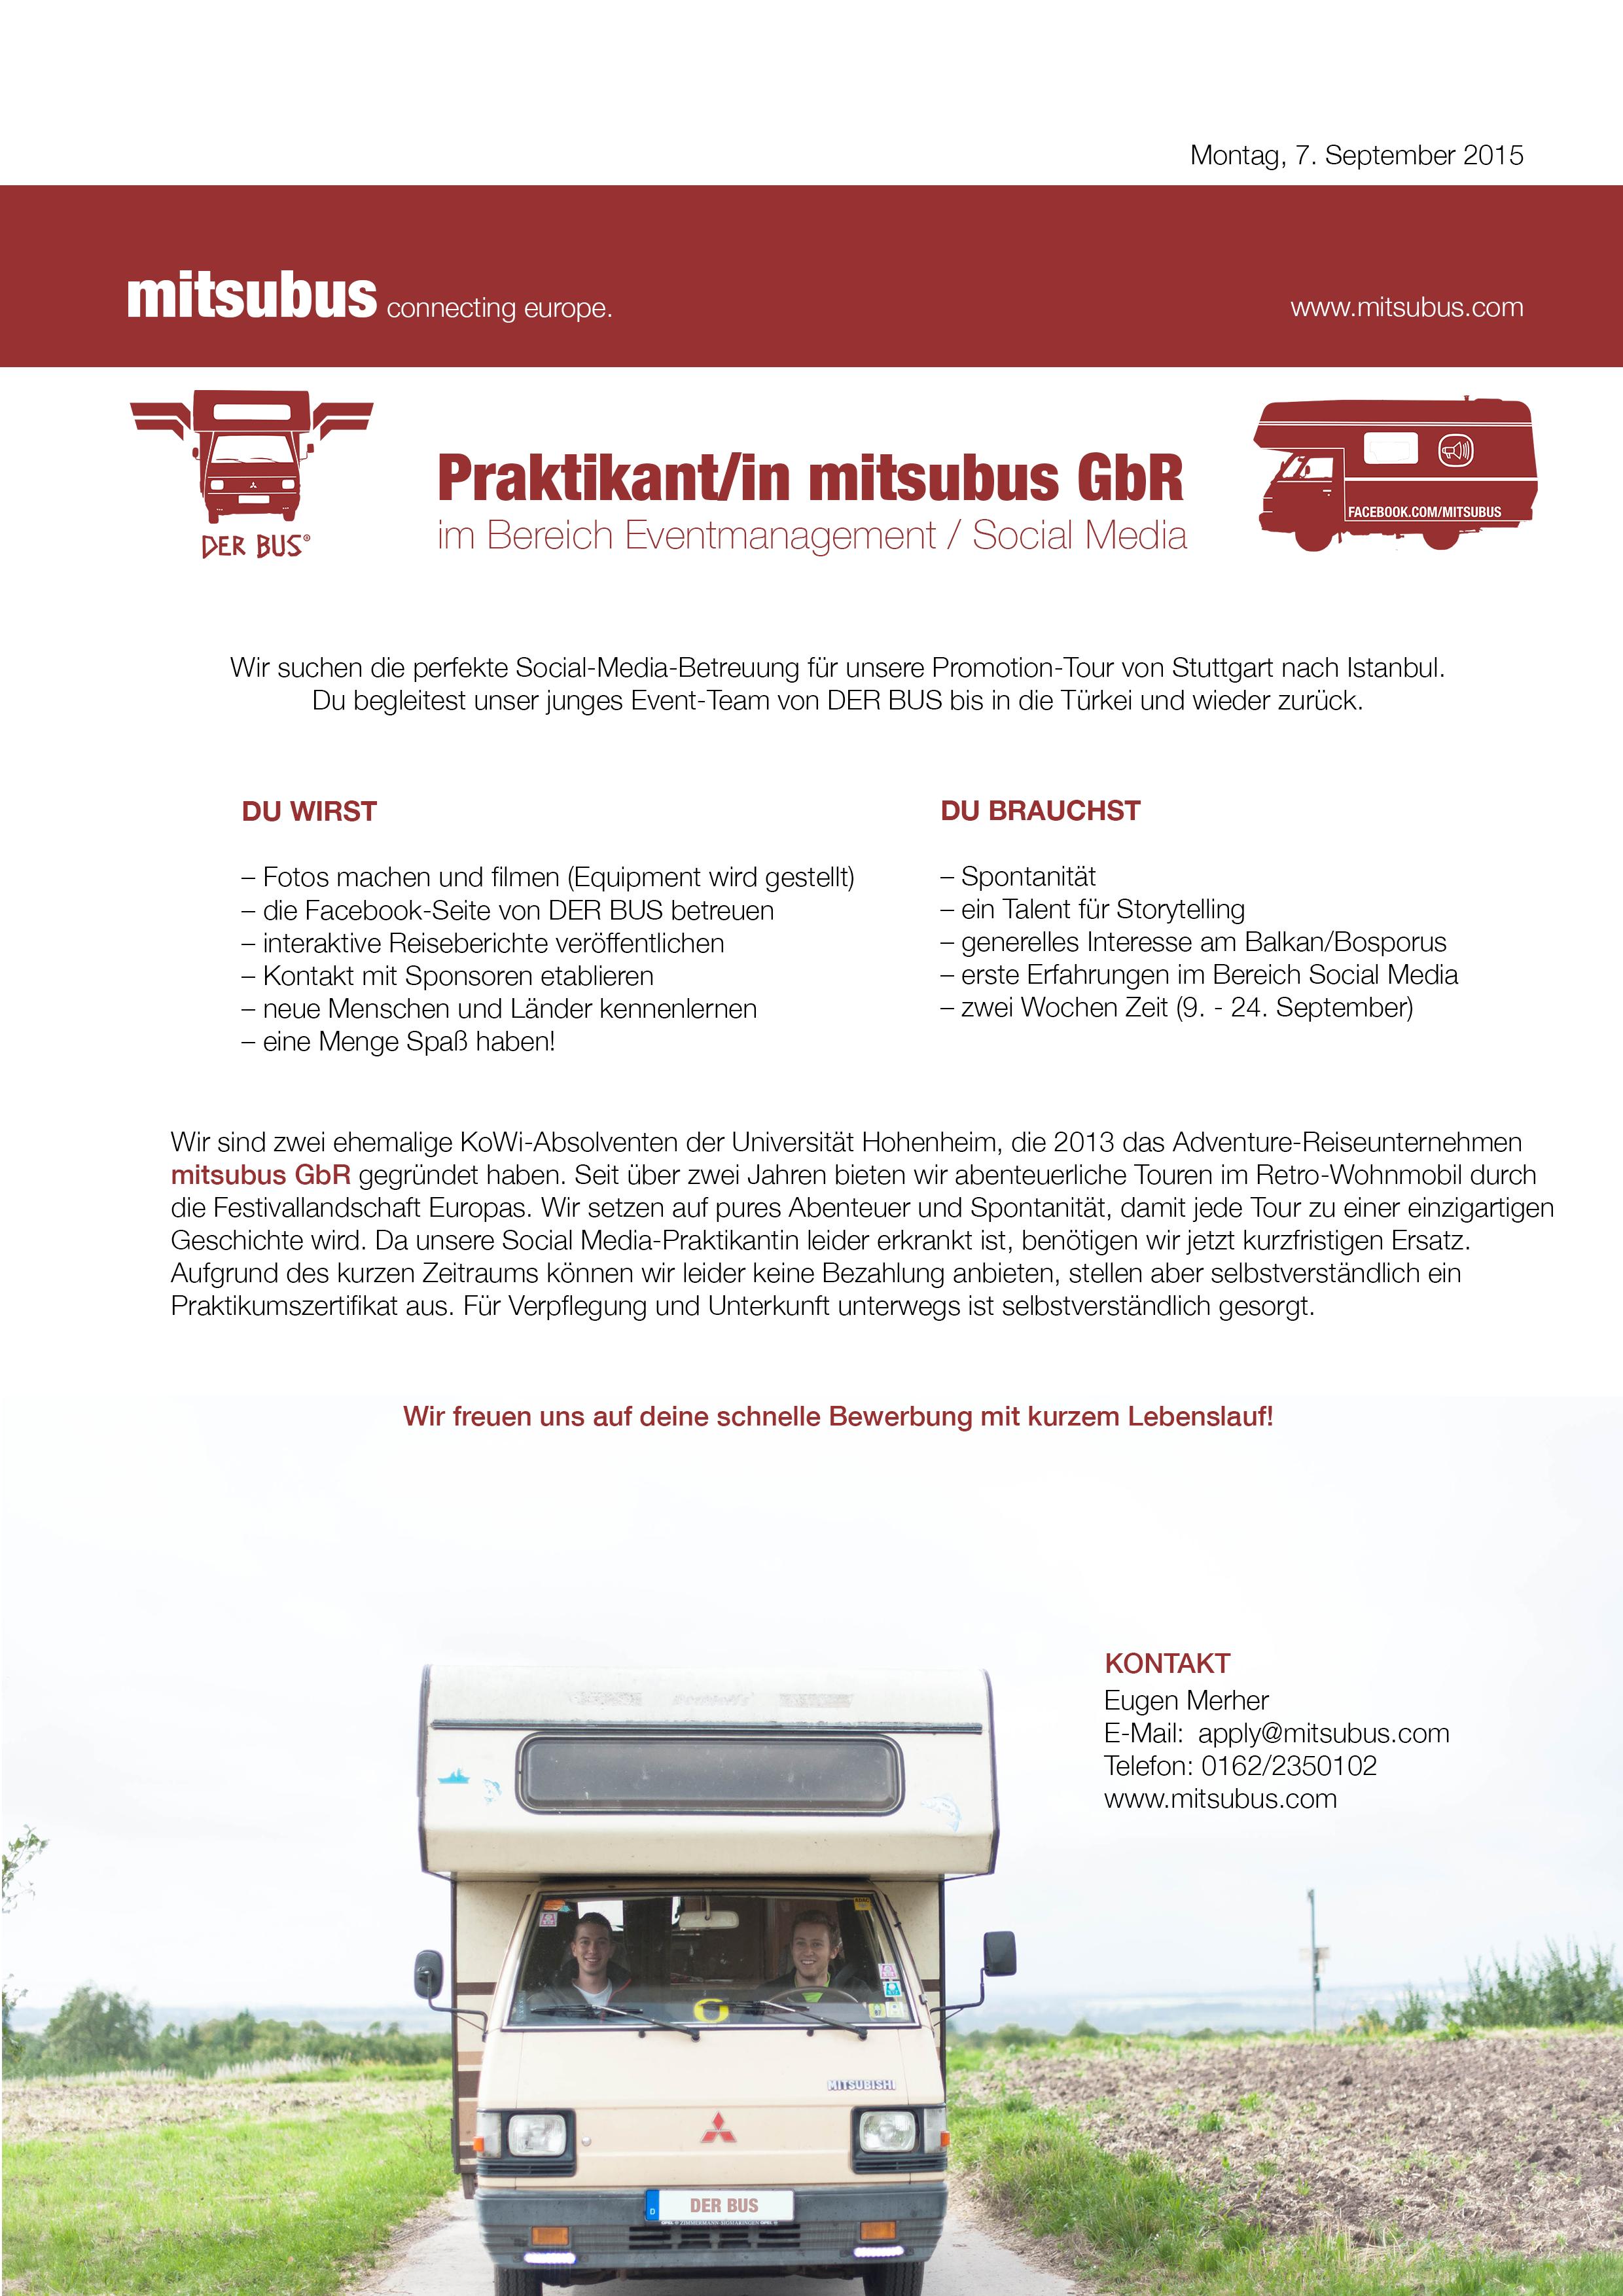 Apply now | mitsubus